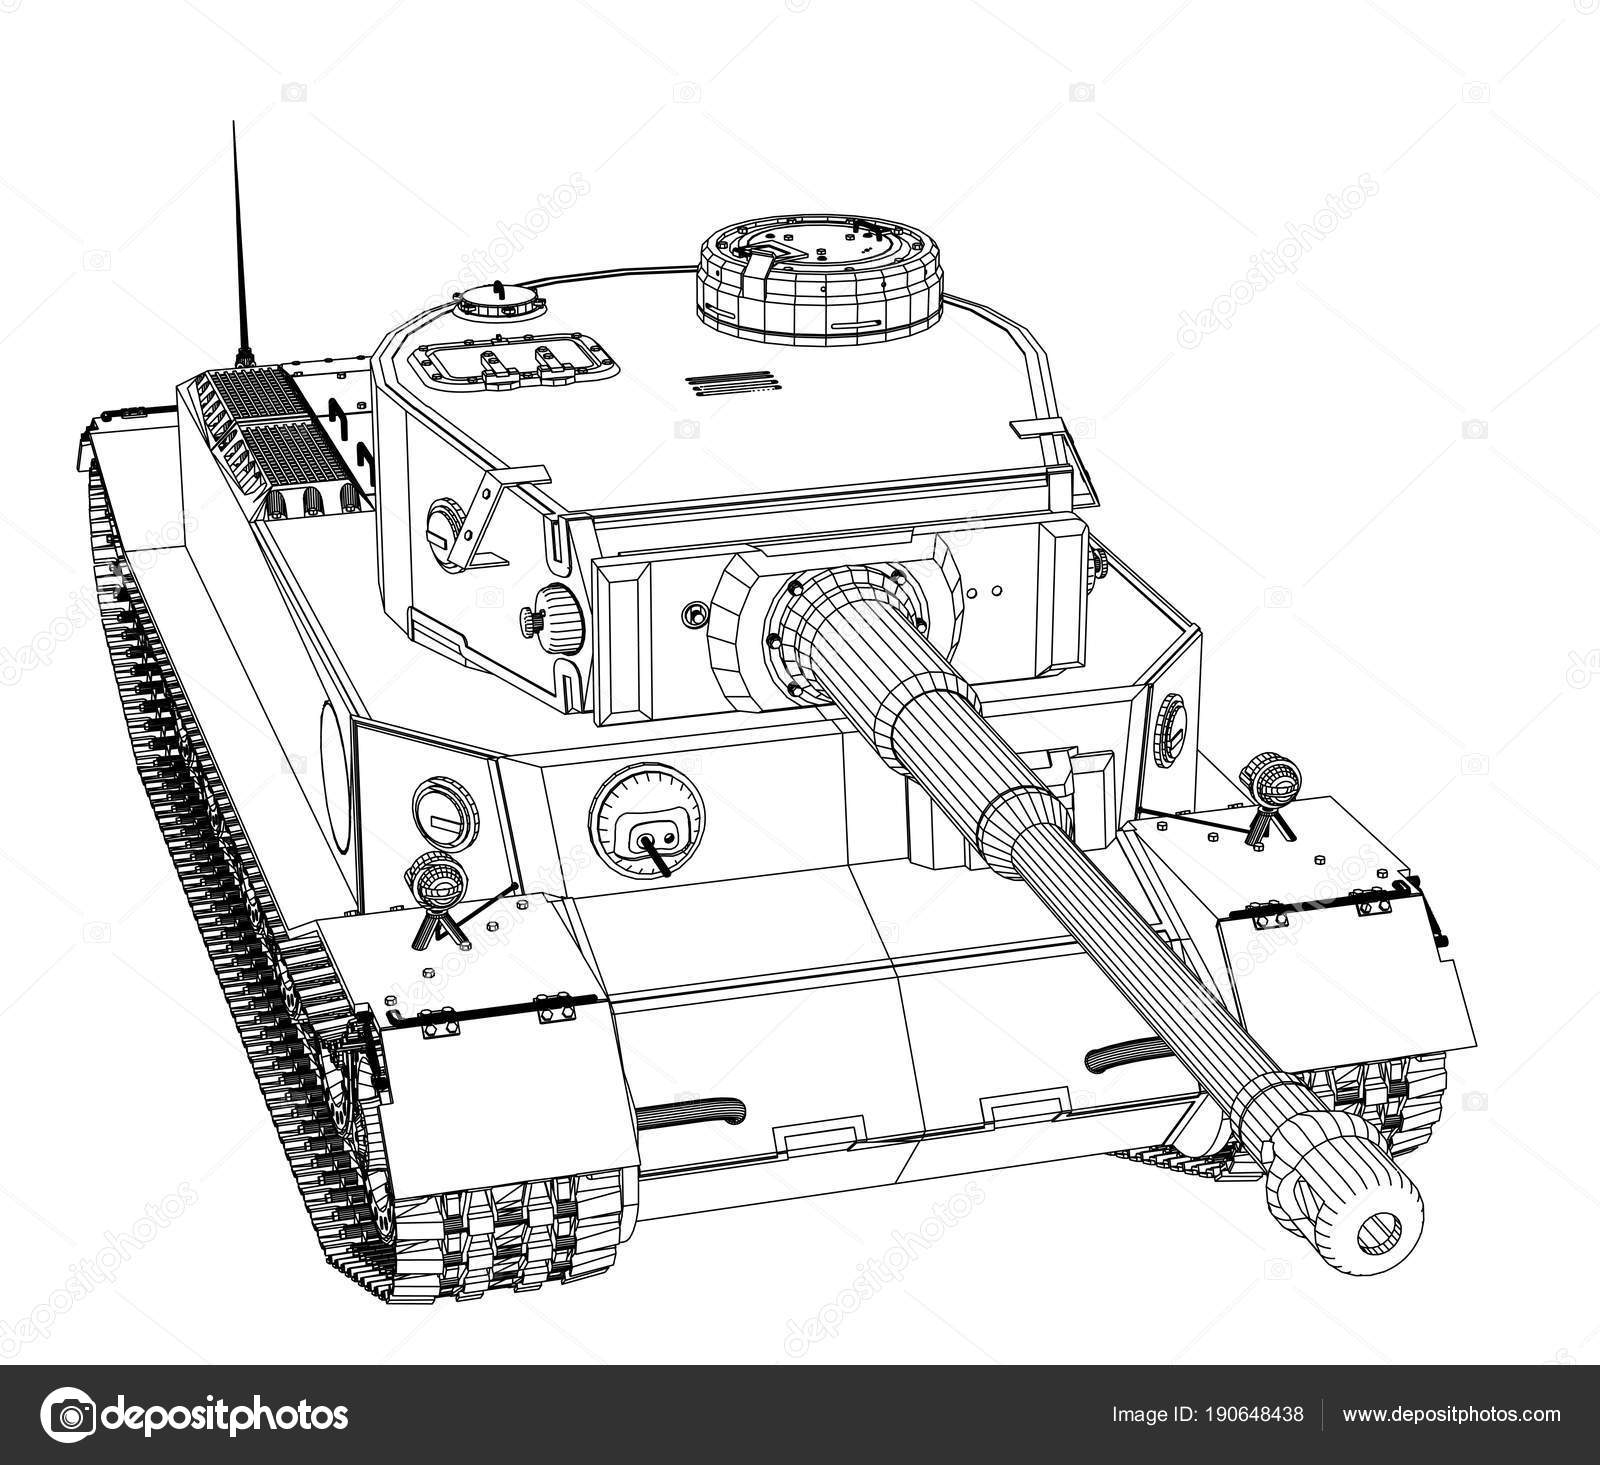 Blueprint of realistic tank stock photo cherezoff 190648438 blueprint or sketch of realistic tank 3d illustration photo by cherezoff malvernweather Image collections